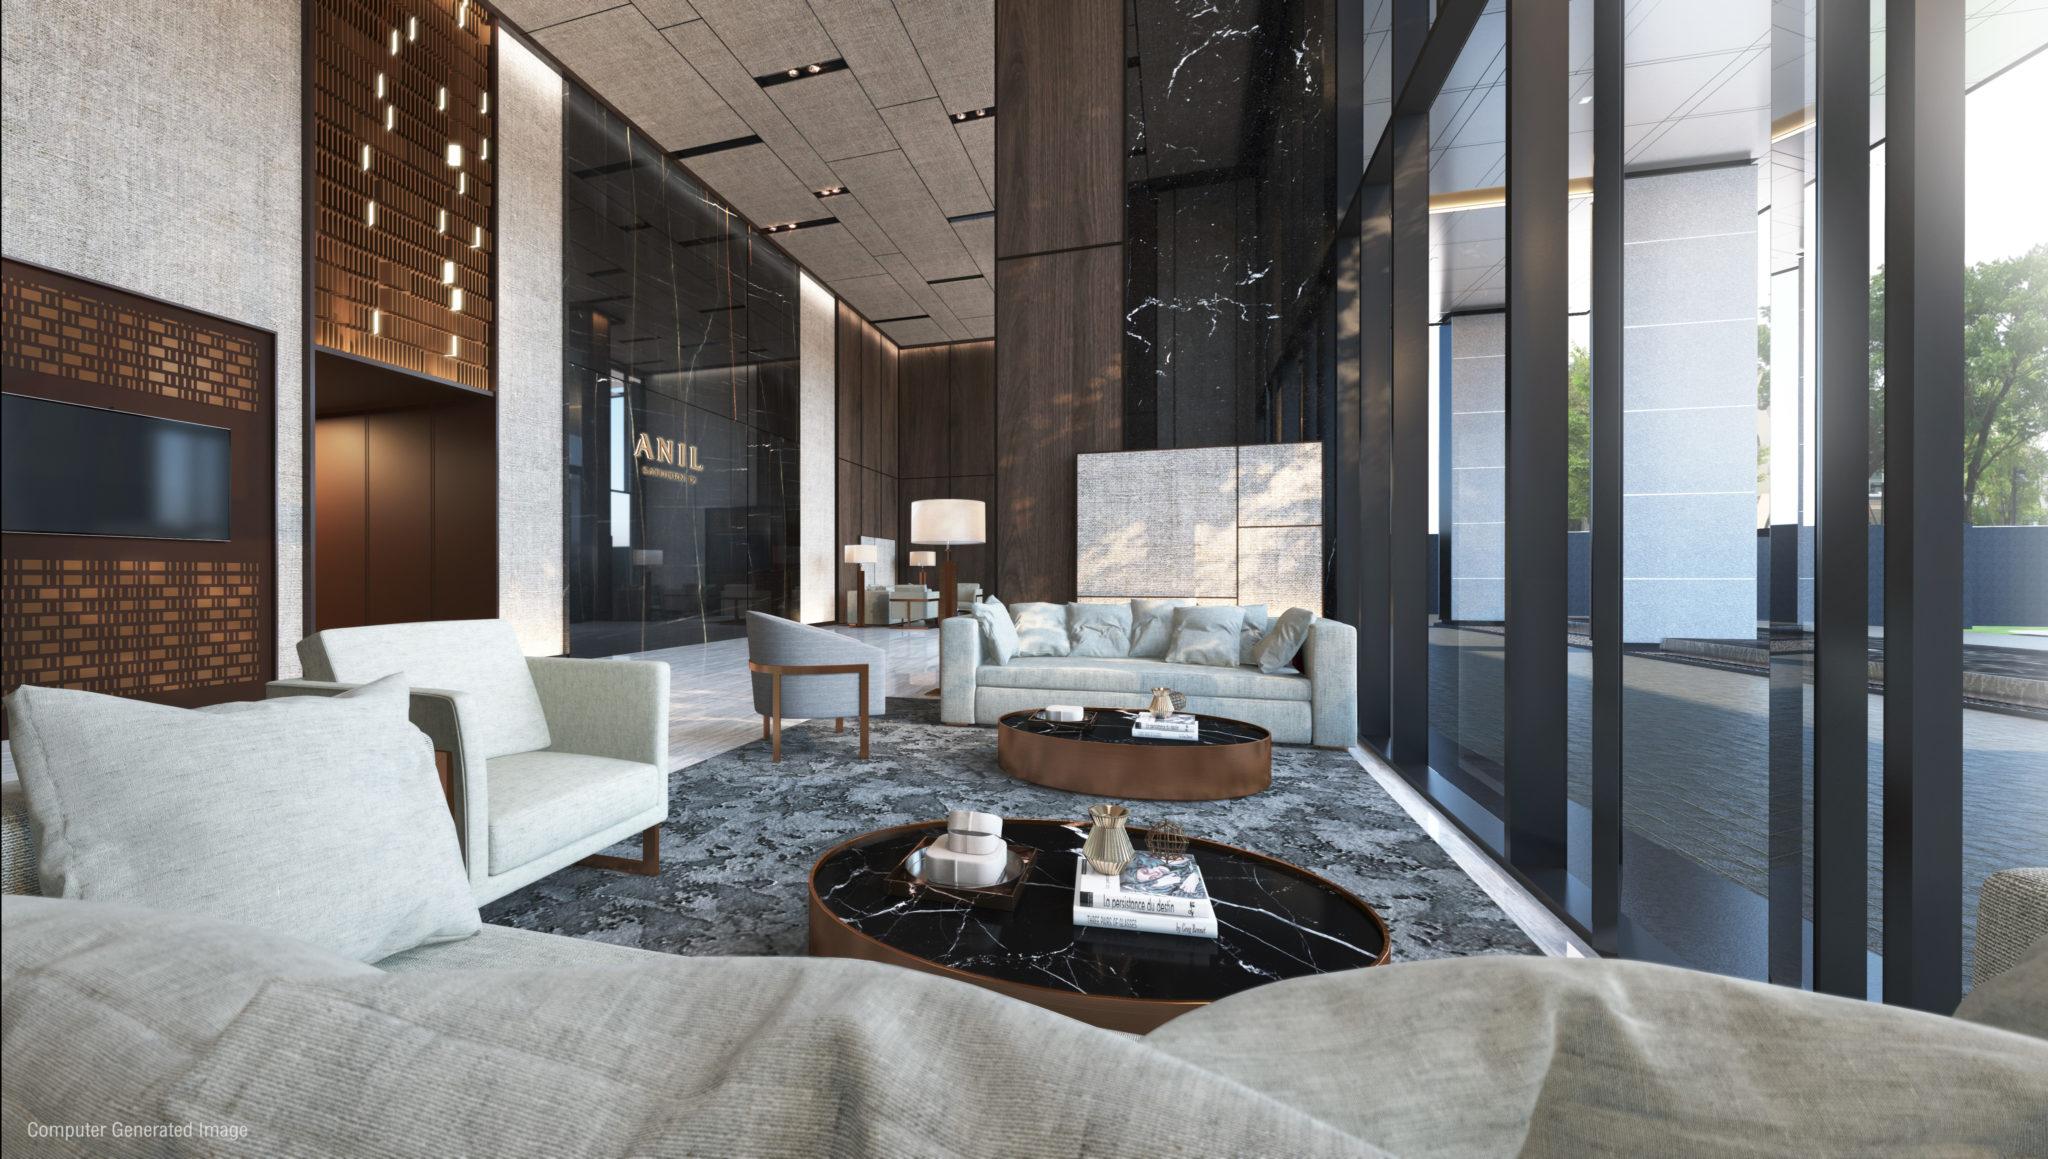 ANIL Sathorn 12 คอนโดสาทรสุดหรูที่ยกระดับคุณภาพชีวิตของผู้พักอาศัย ด้วยมาตรฐาน WELL Building Standard 25 - GRAND UNITY